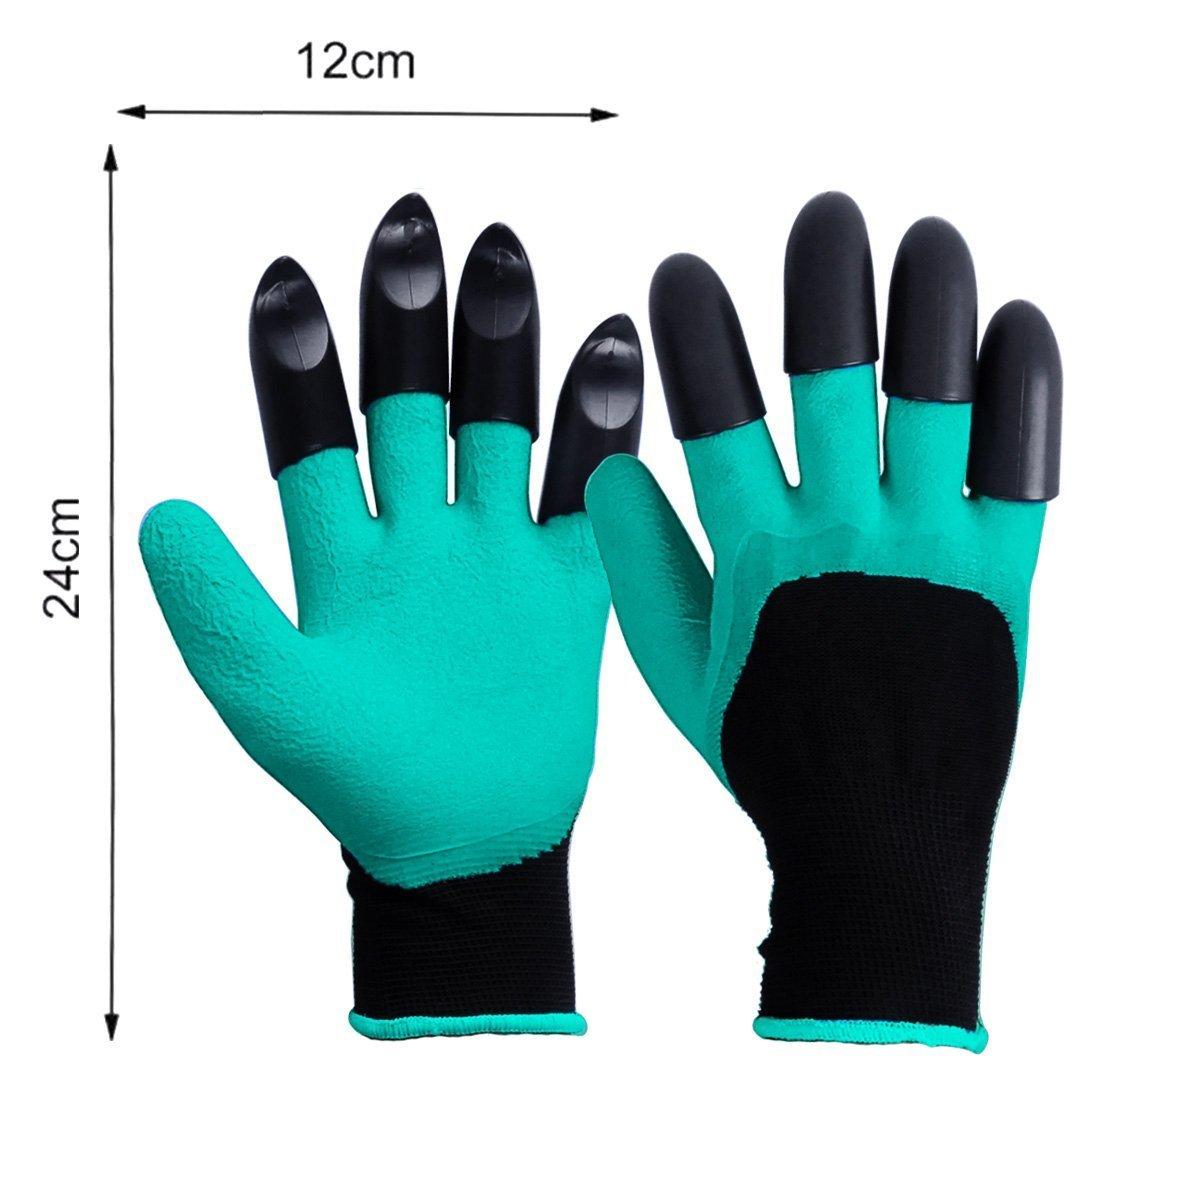 Arbeitsschutz Gartenhandschuhe mit Fingerspitzen Pflanzen Gartenger/äte Handschuhe